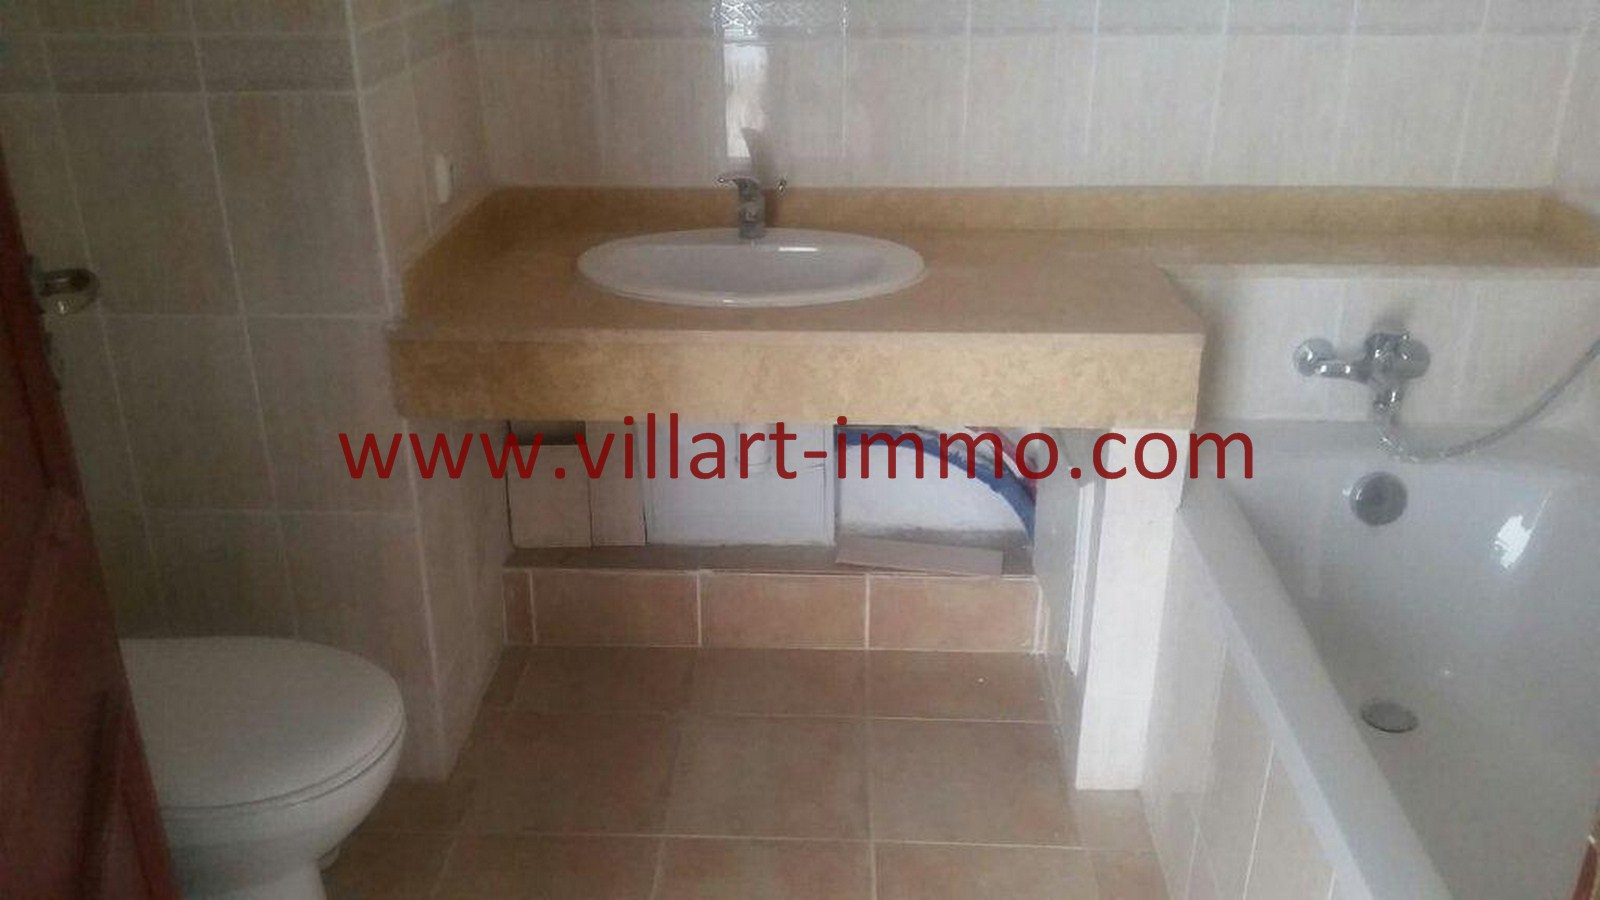 Salle De Bain Rabat Maroc ~ A Vendre Appartement F4 Situ Au Sein D Un Complexe Tanger Villart